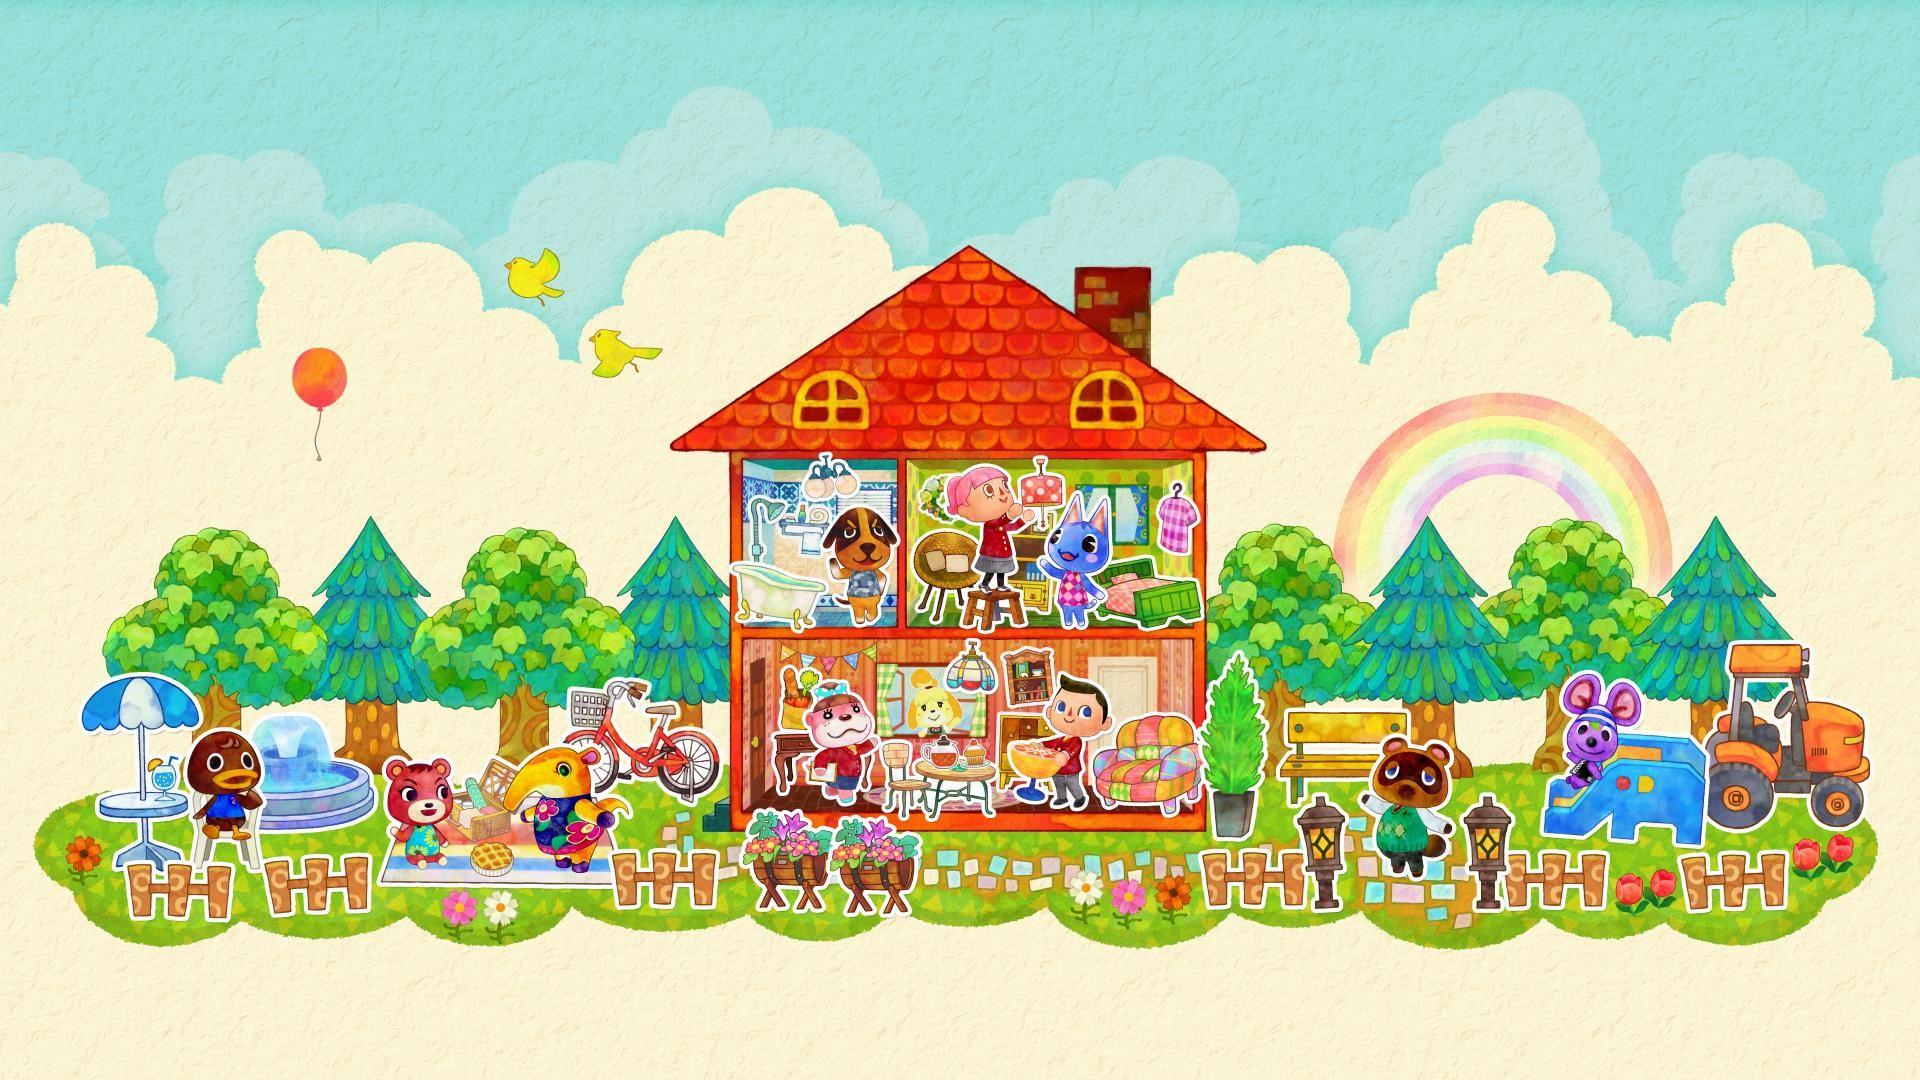 Animal Crossing Hd Wallpaper 82 Images